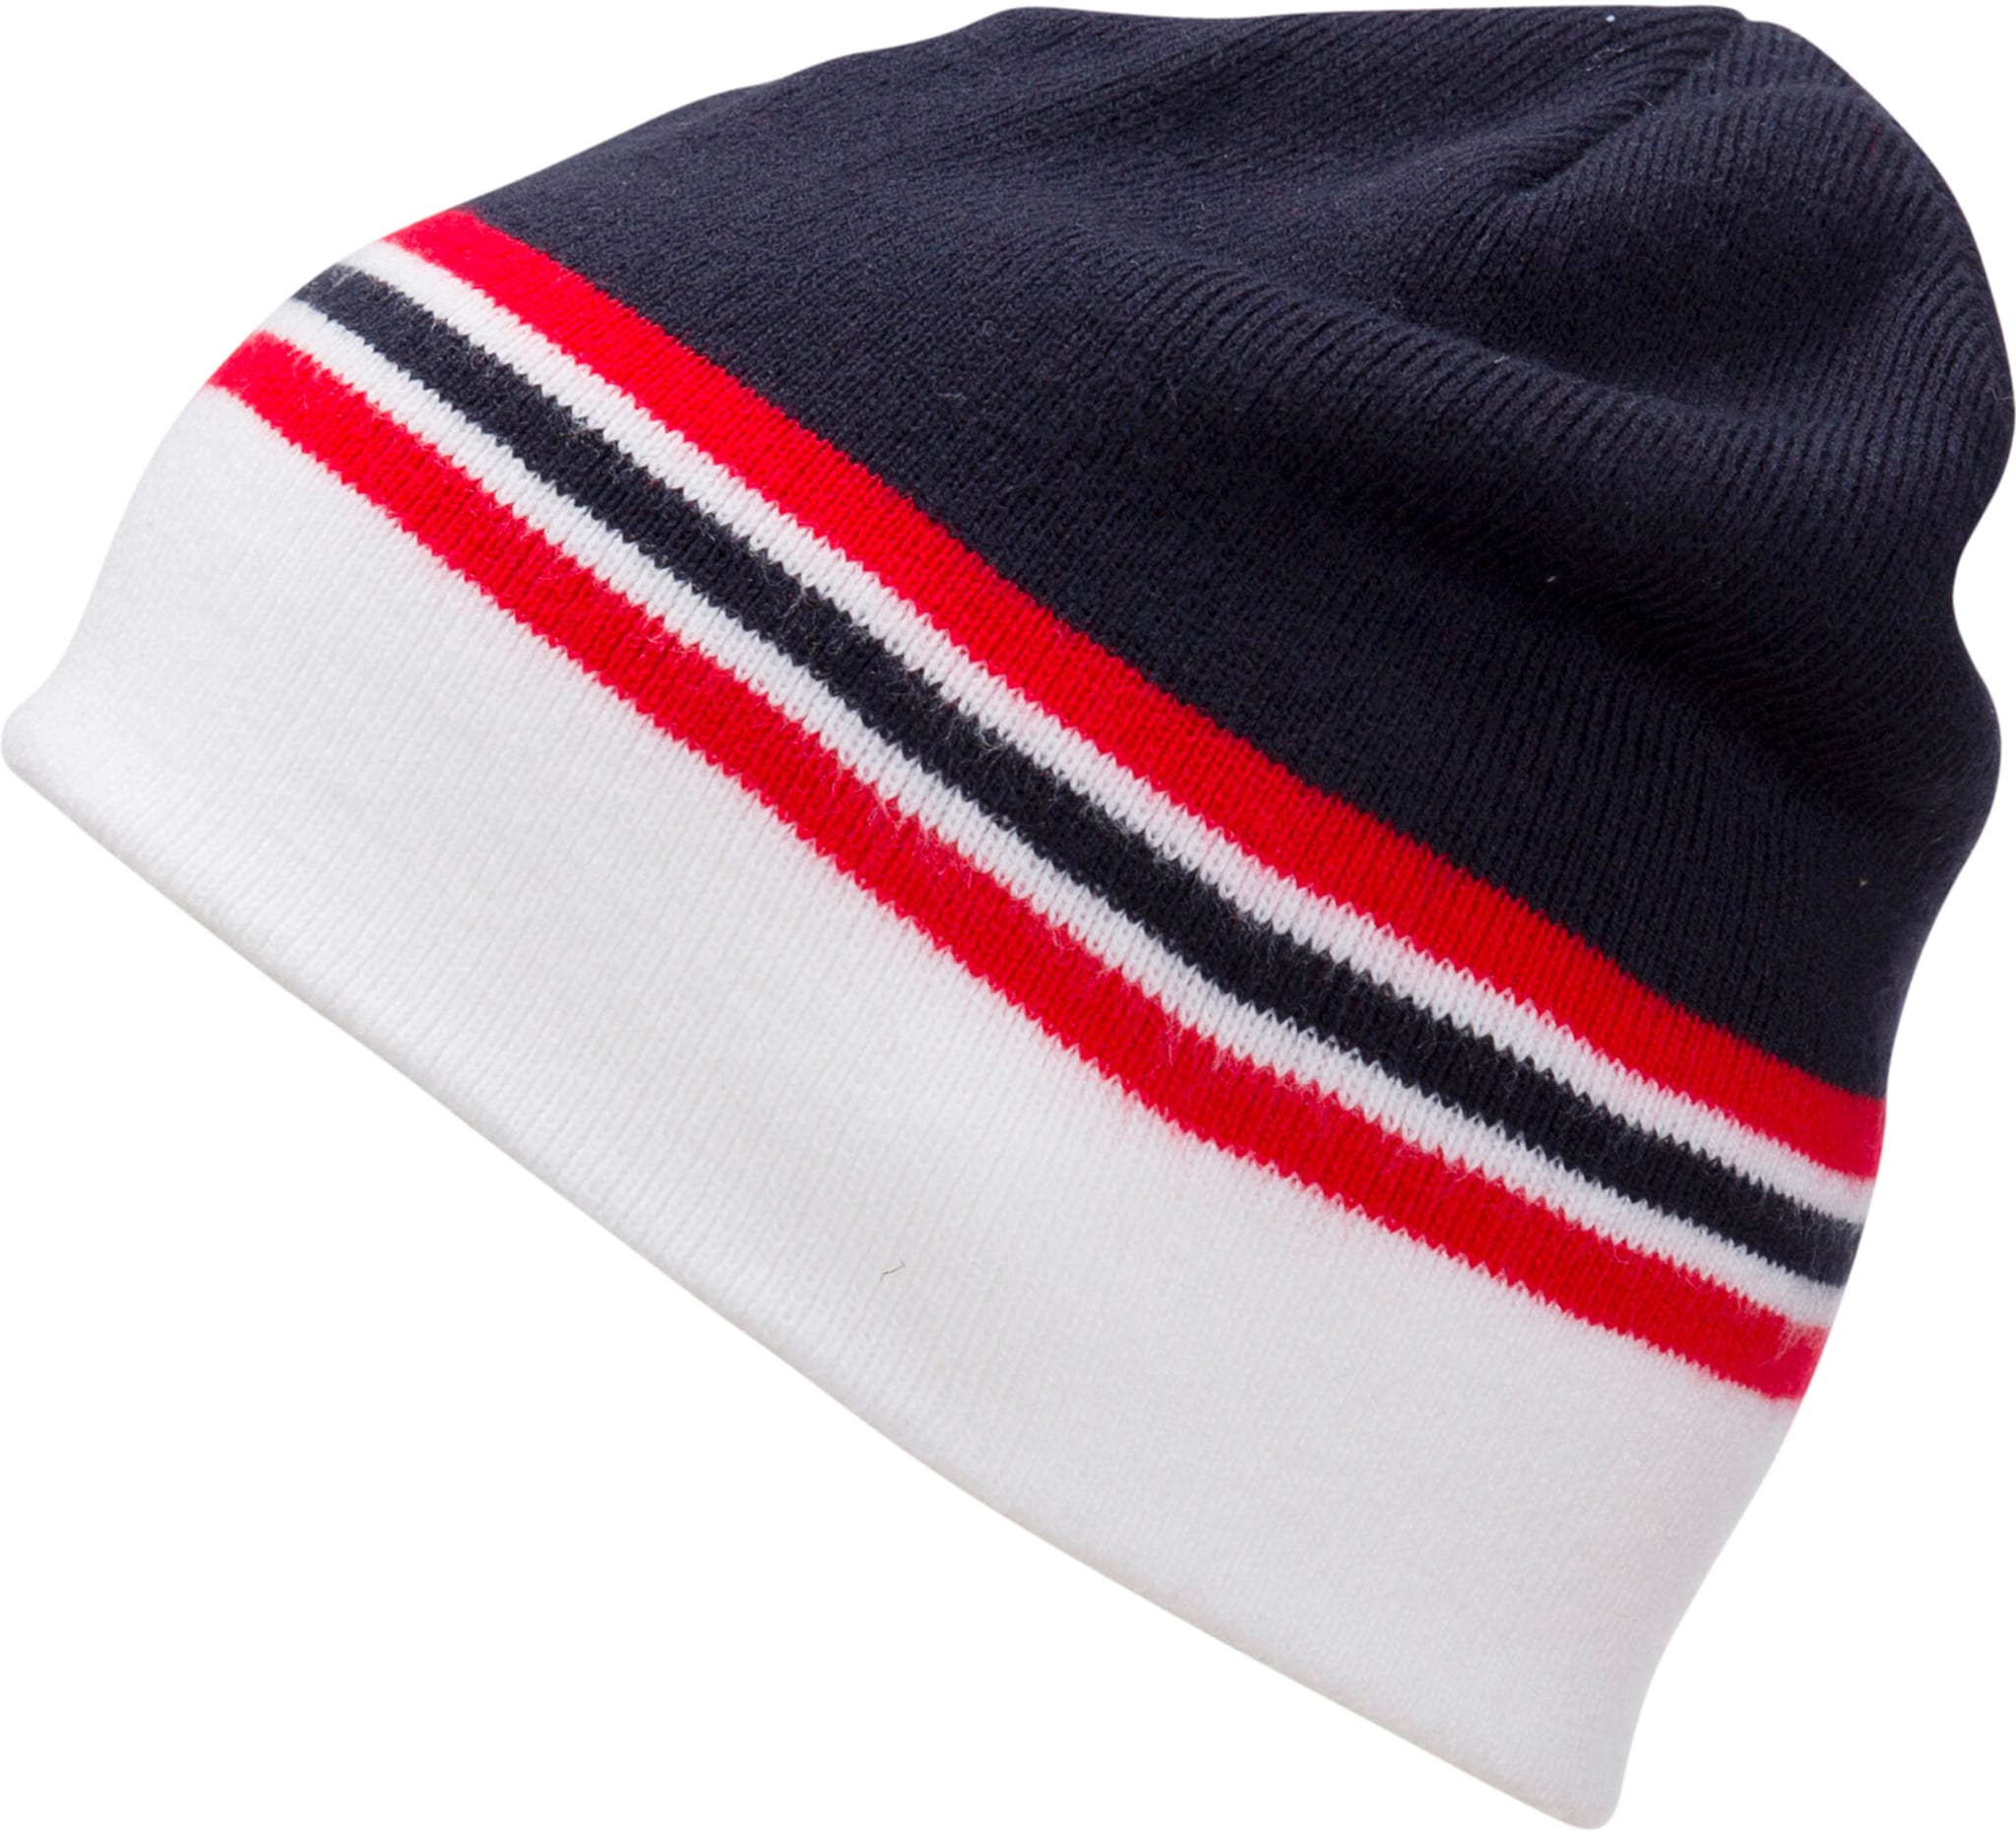 Games hat